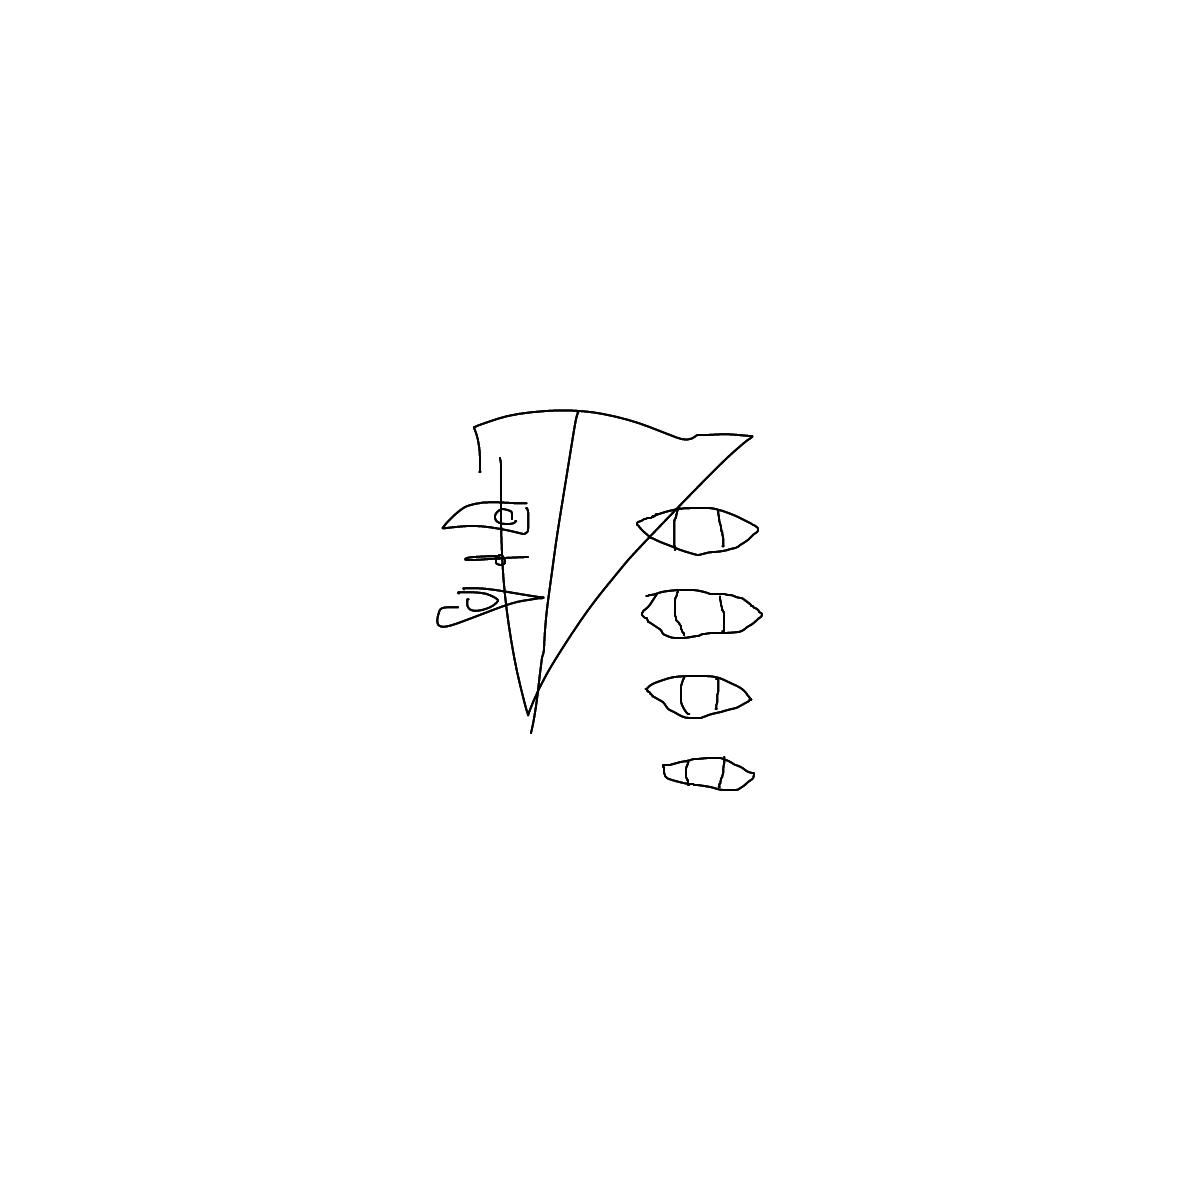 BAAAM drawing#17389 lat:45.1081771850585940lng: 7.7720494270324710